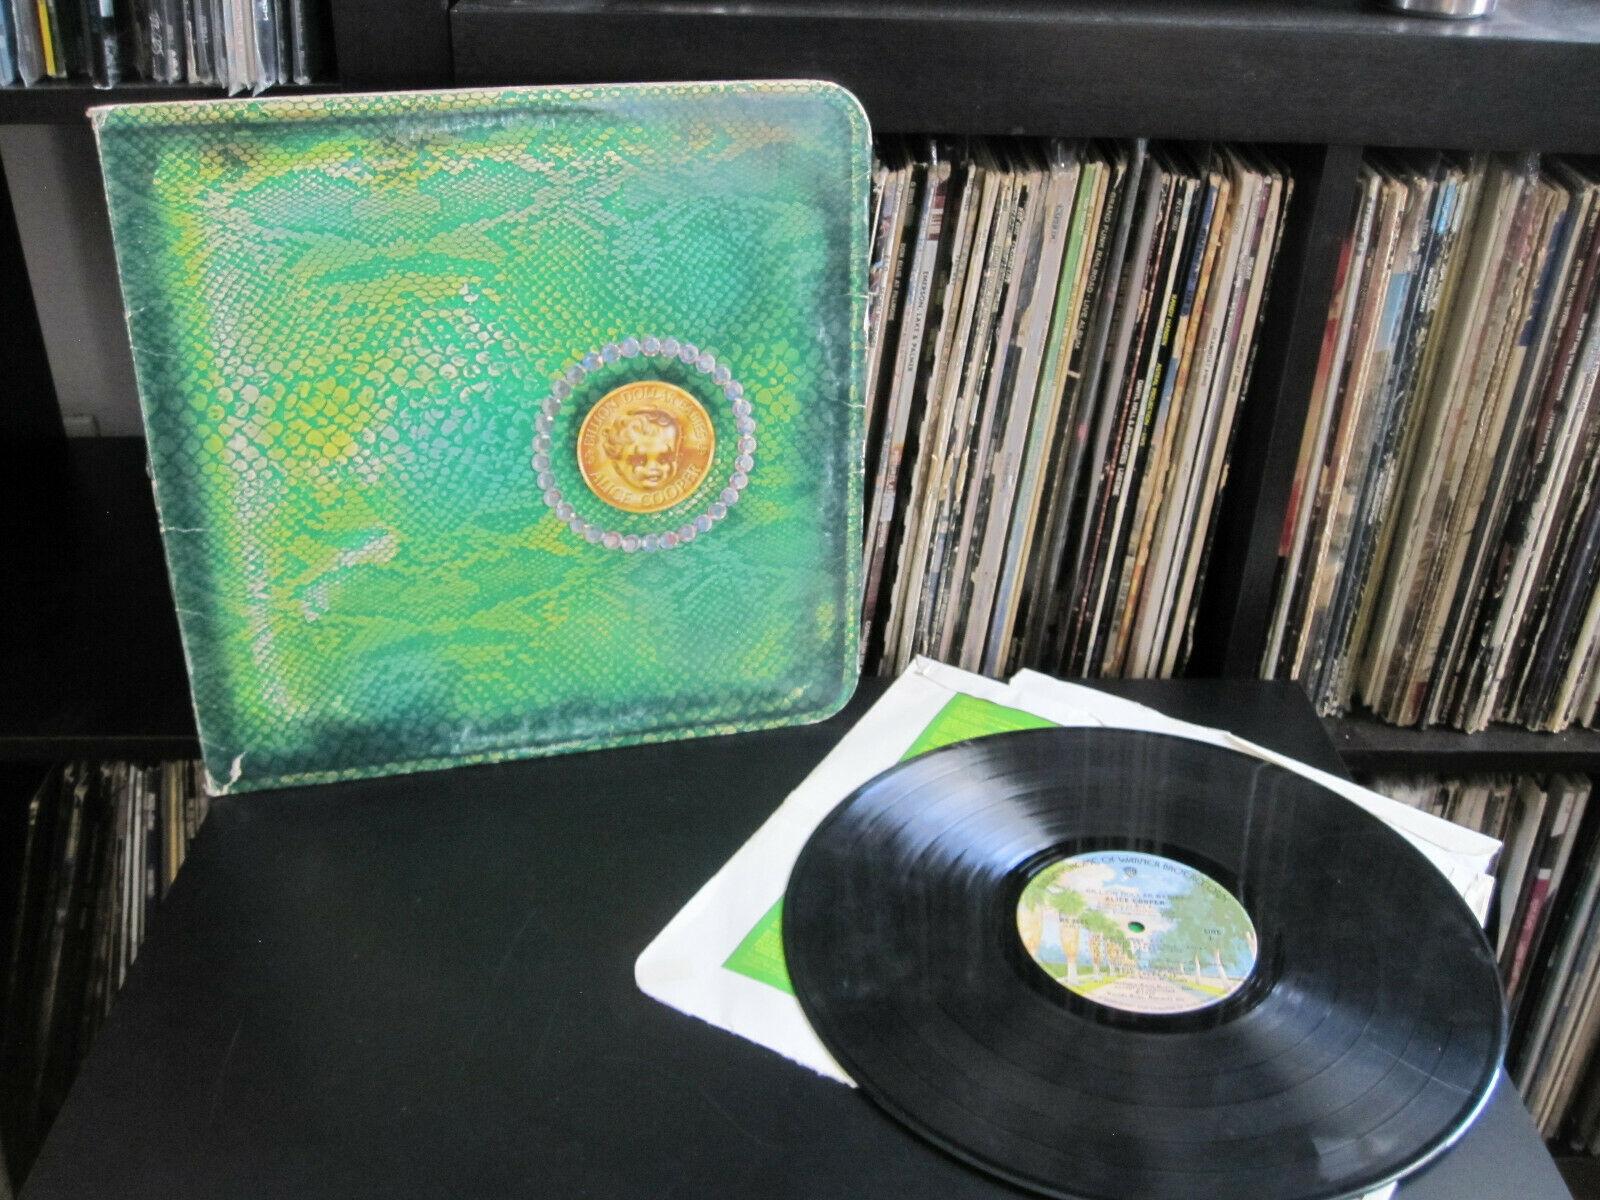 Alice Cooper        Billion Dollar Babies 1973 WB BS 2685 LP Rock Record G  G